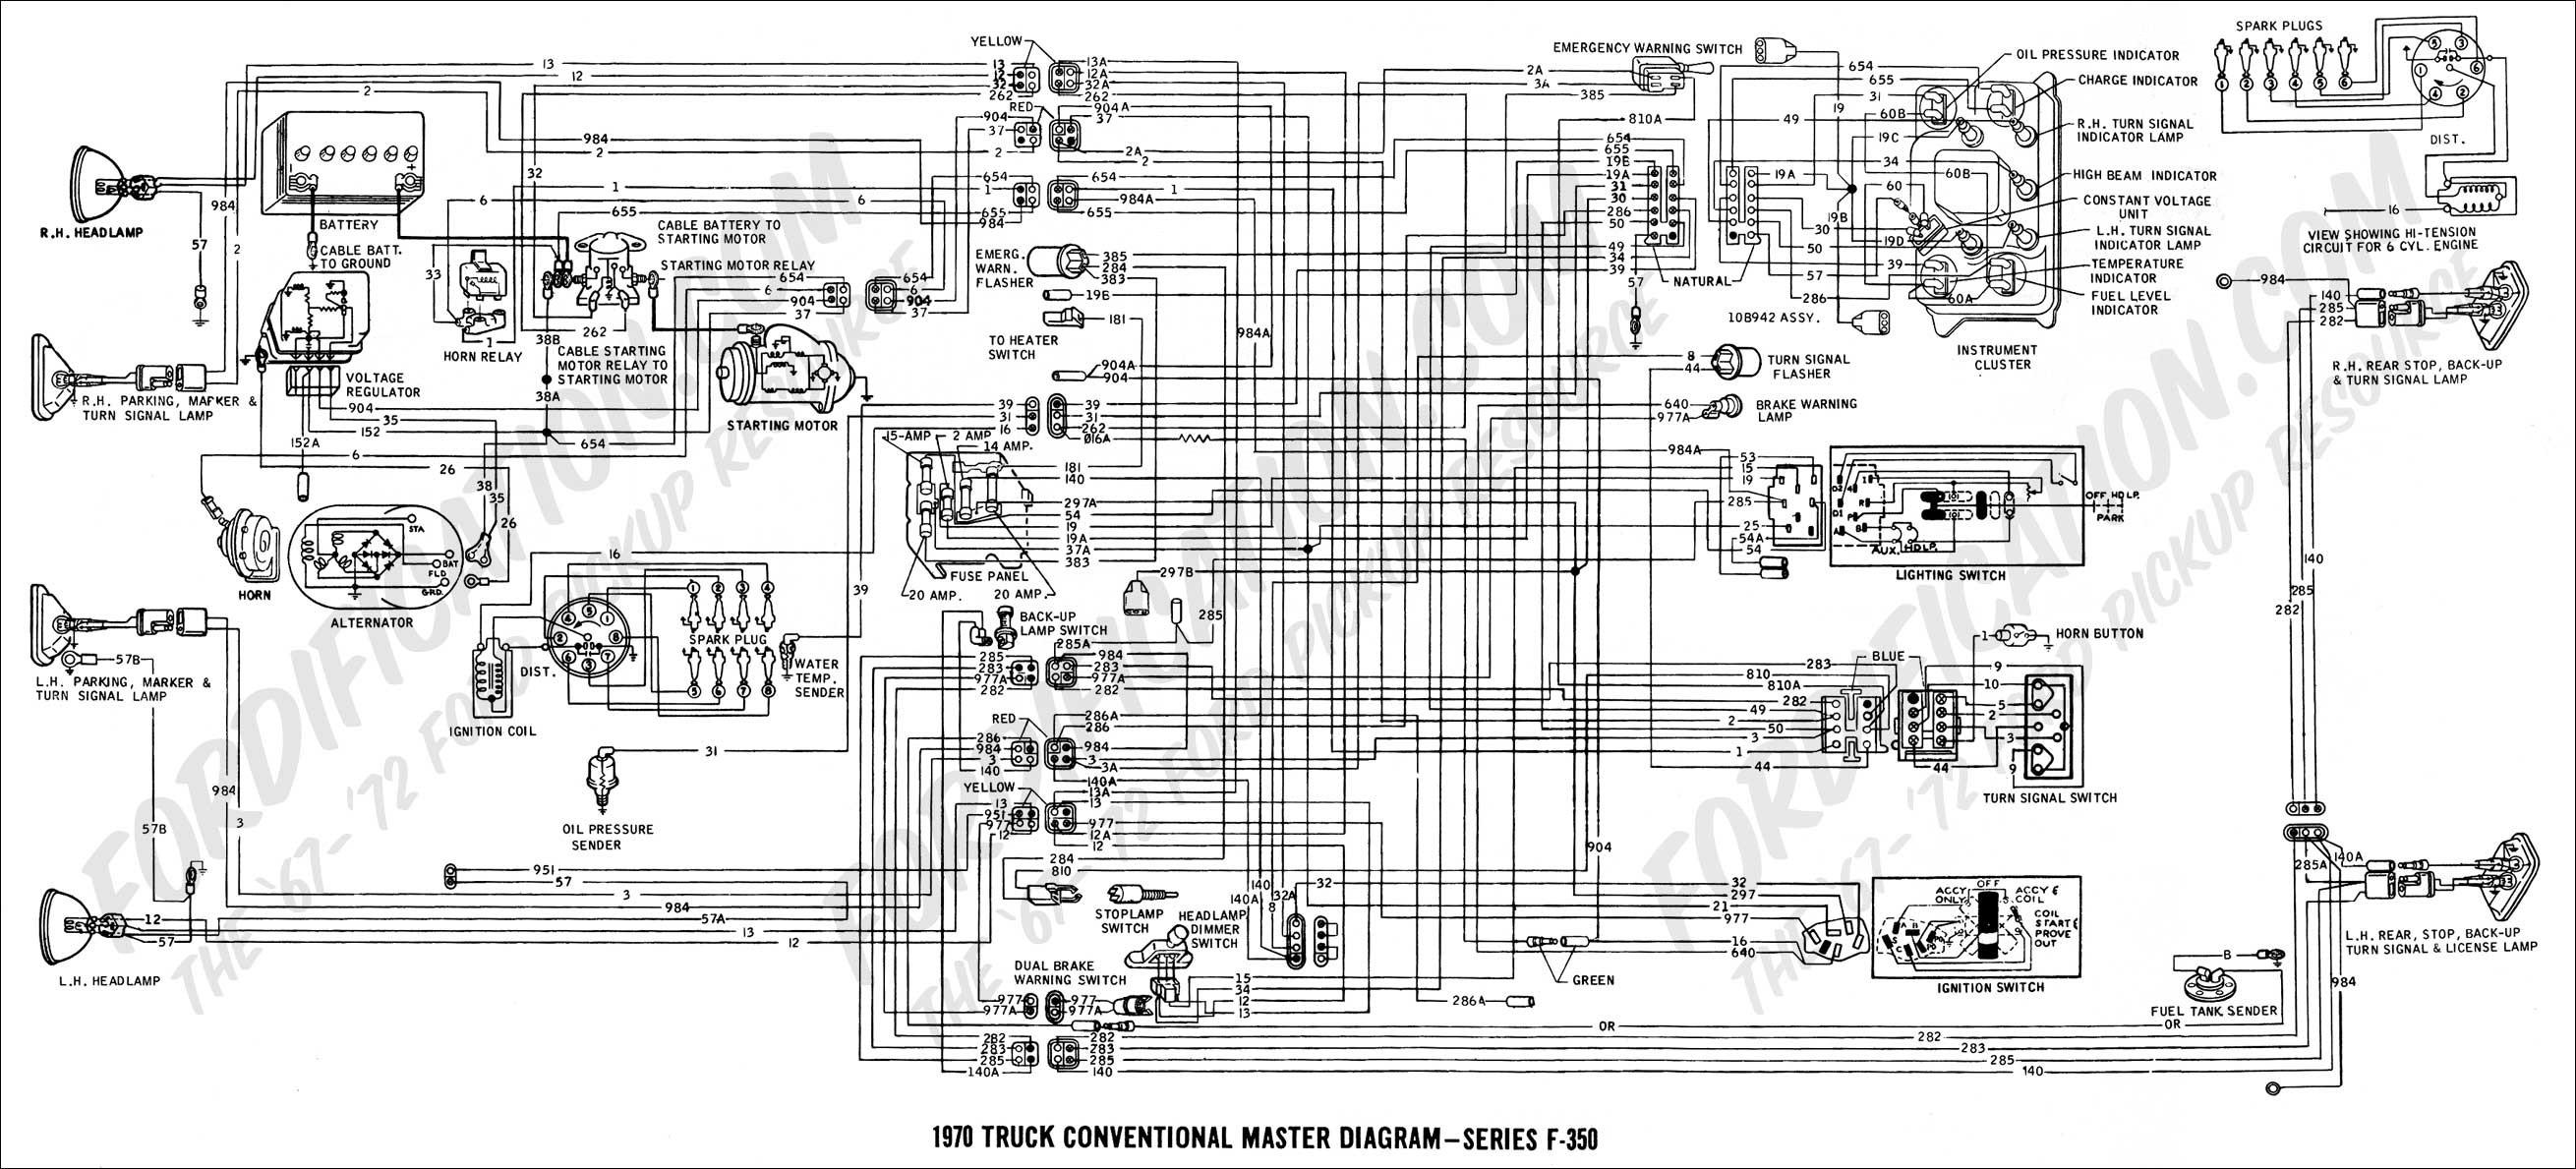 Saturn Vue Engine Diagram Electrical Wiring Dash 2002 Find U2022